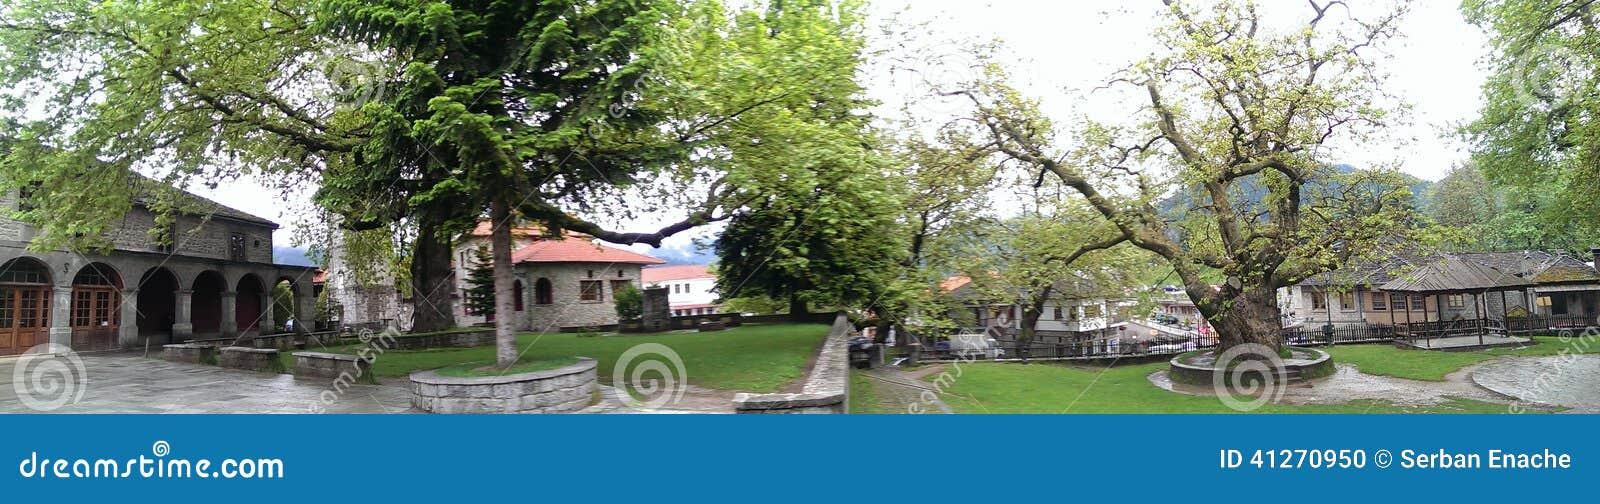 Central square in Metsovo